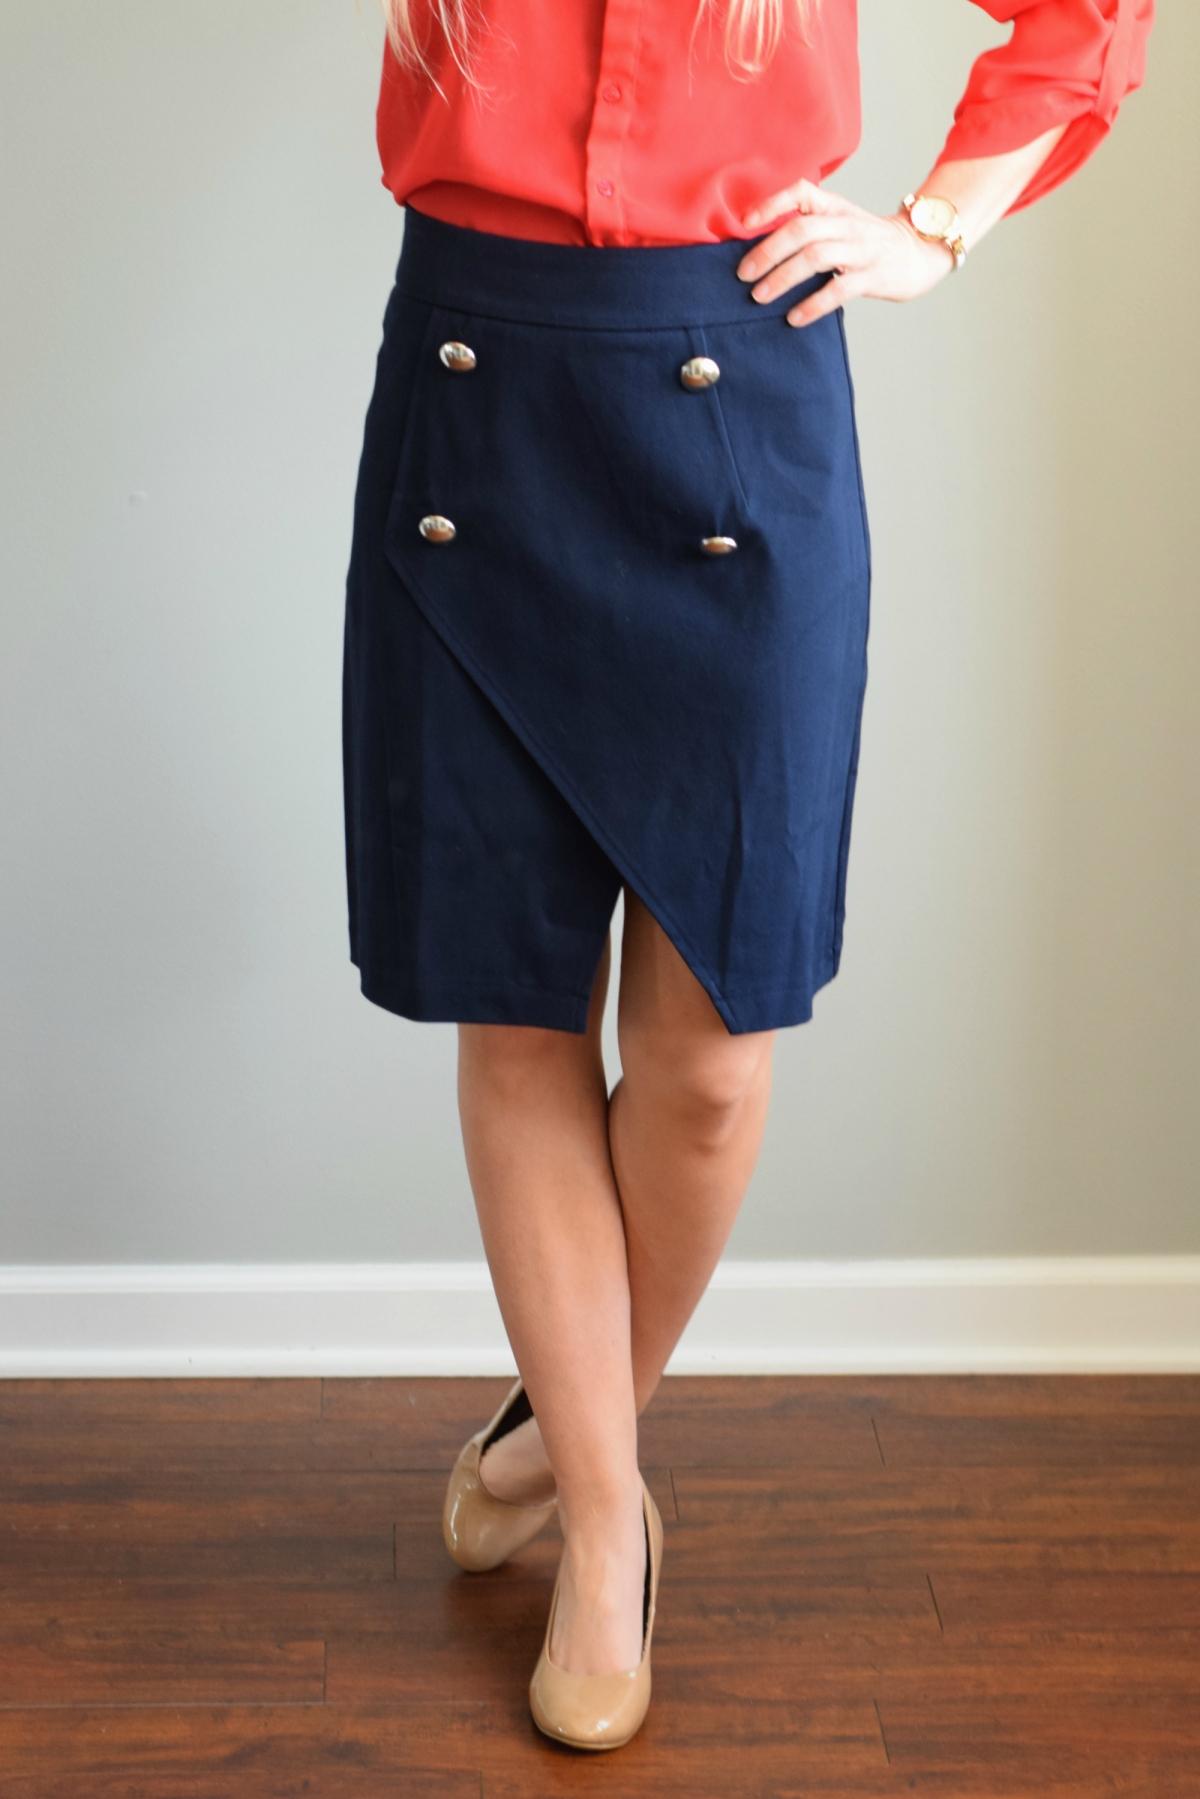 March 2016 Stitch Fix Review: 41Hawthorn Piper Asymmetrical Hem Skirt |www.pearlsandsportsbras.com|